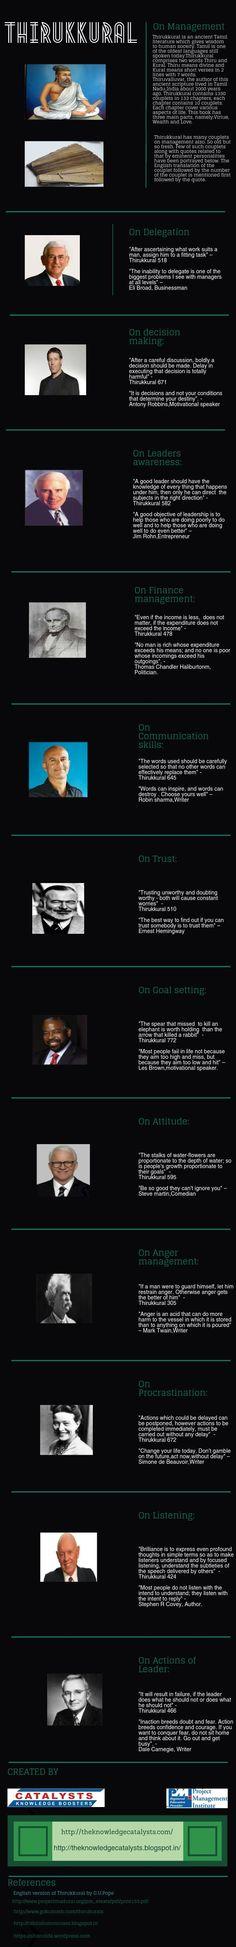 12 Management Mantras by Thiruvalluvar | @Piktochart Infographic